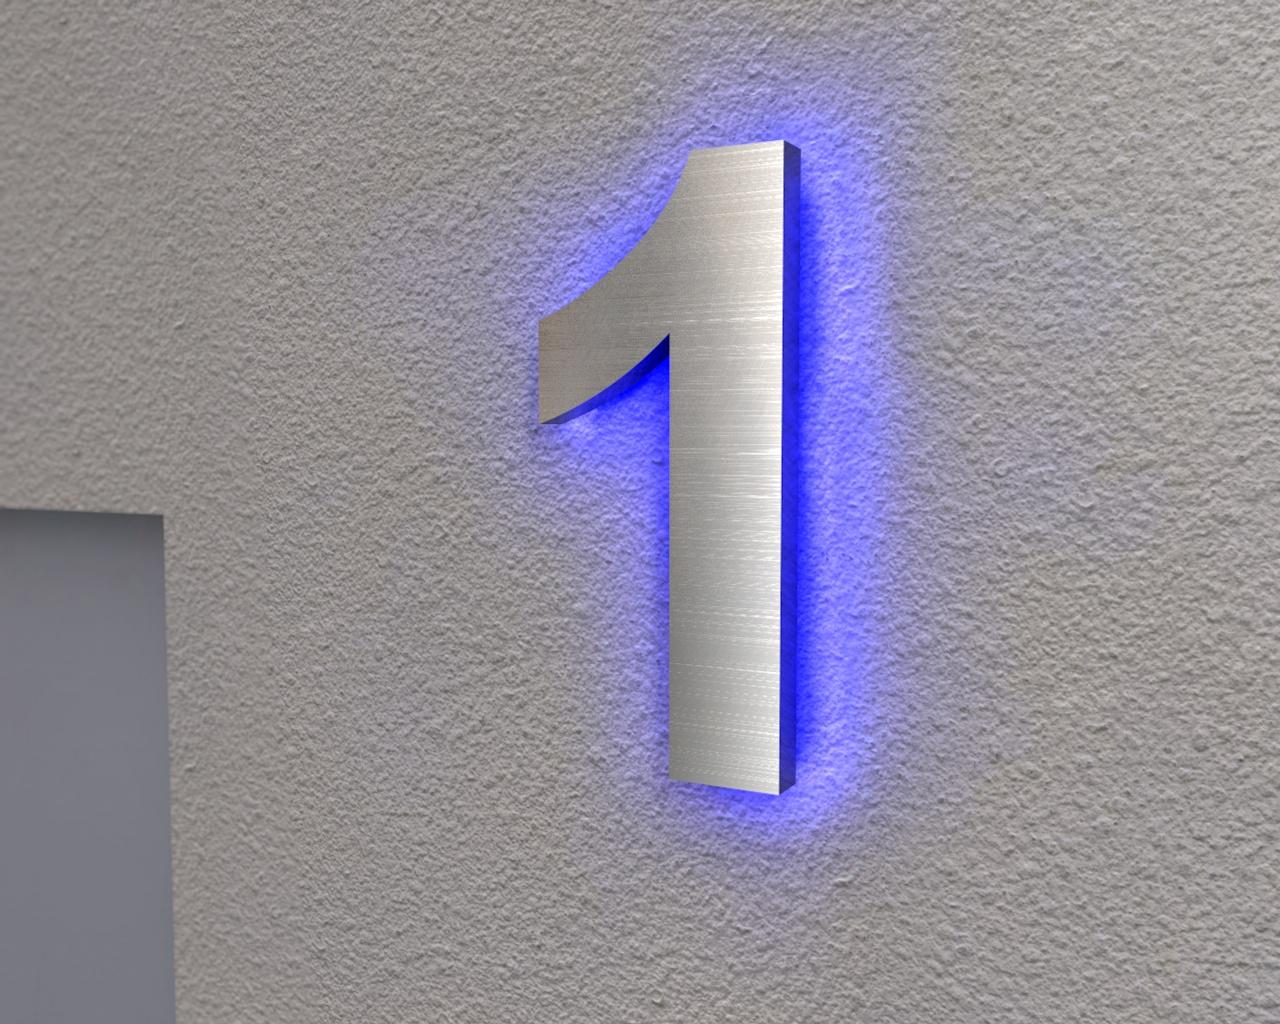 edelstahl hausnummer beleuchtete hausnummer 1 ambilight. Black Bedroom Furniture Sets. Home Design Ideas